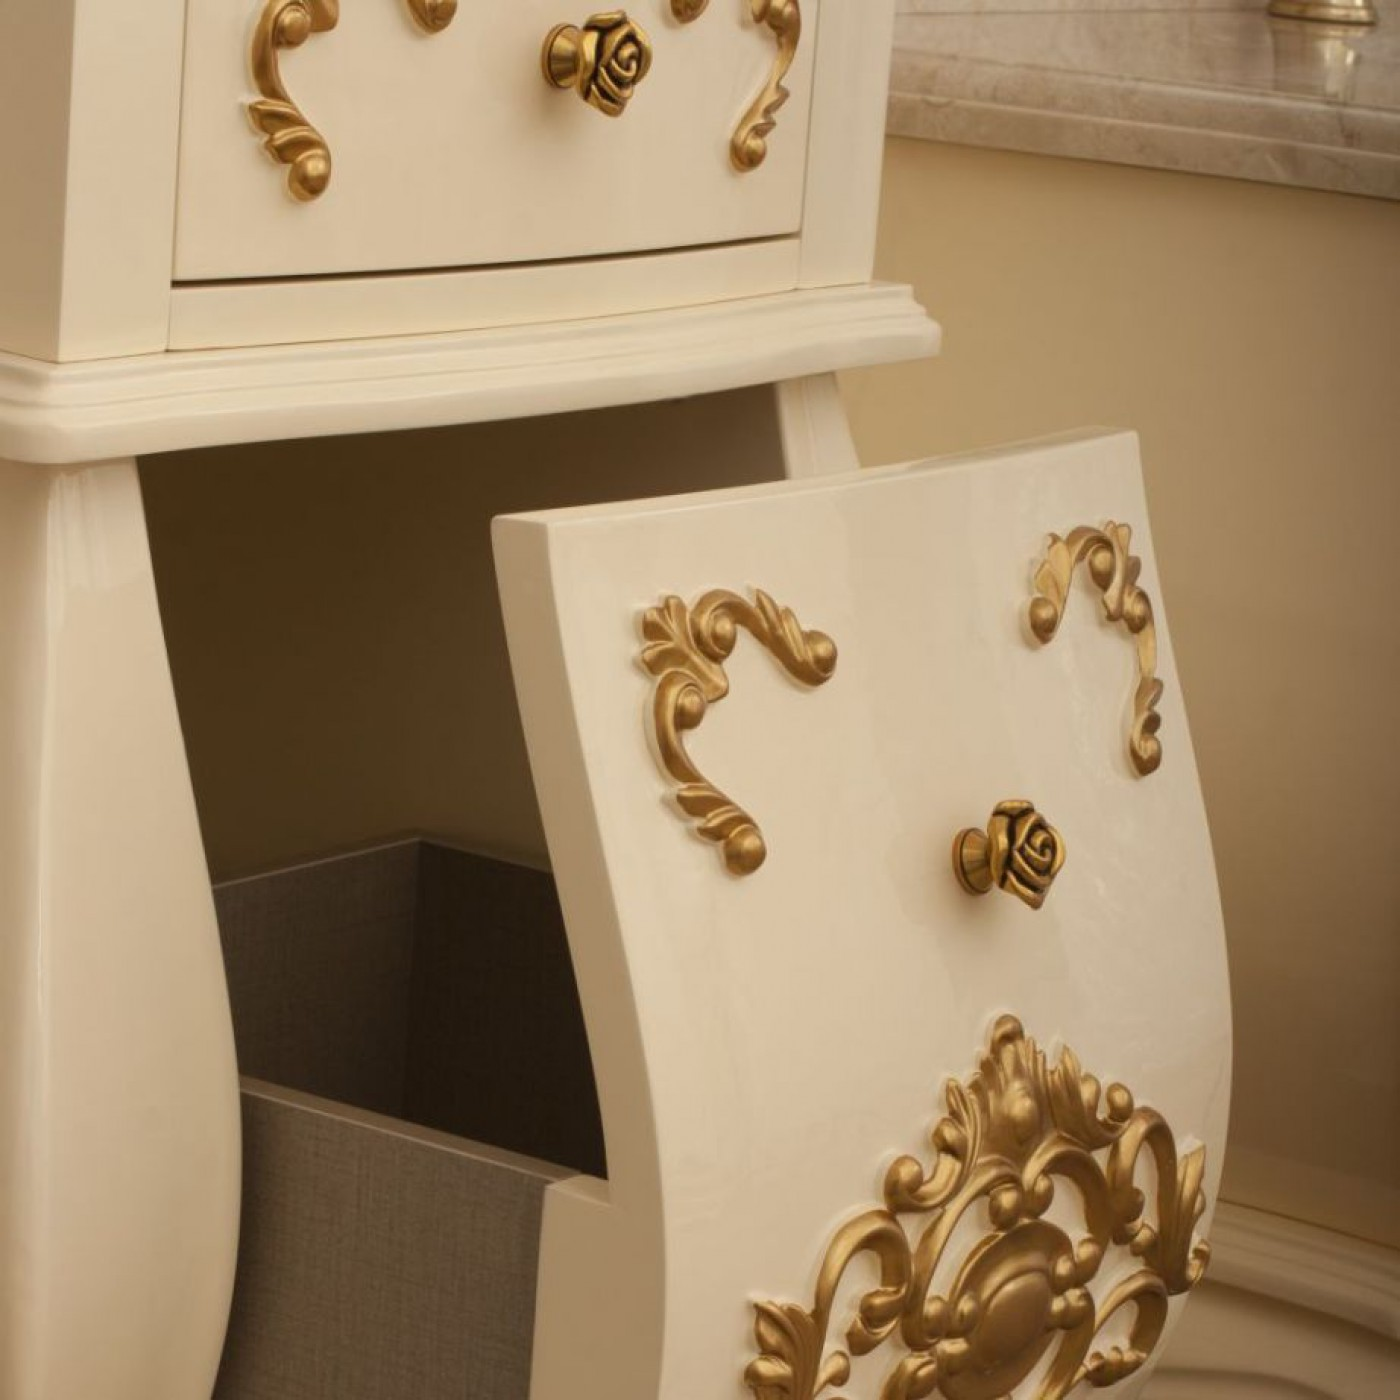 DONATO, мебель для ванных комнат, TESSORO